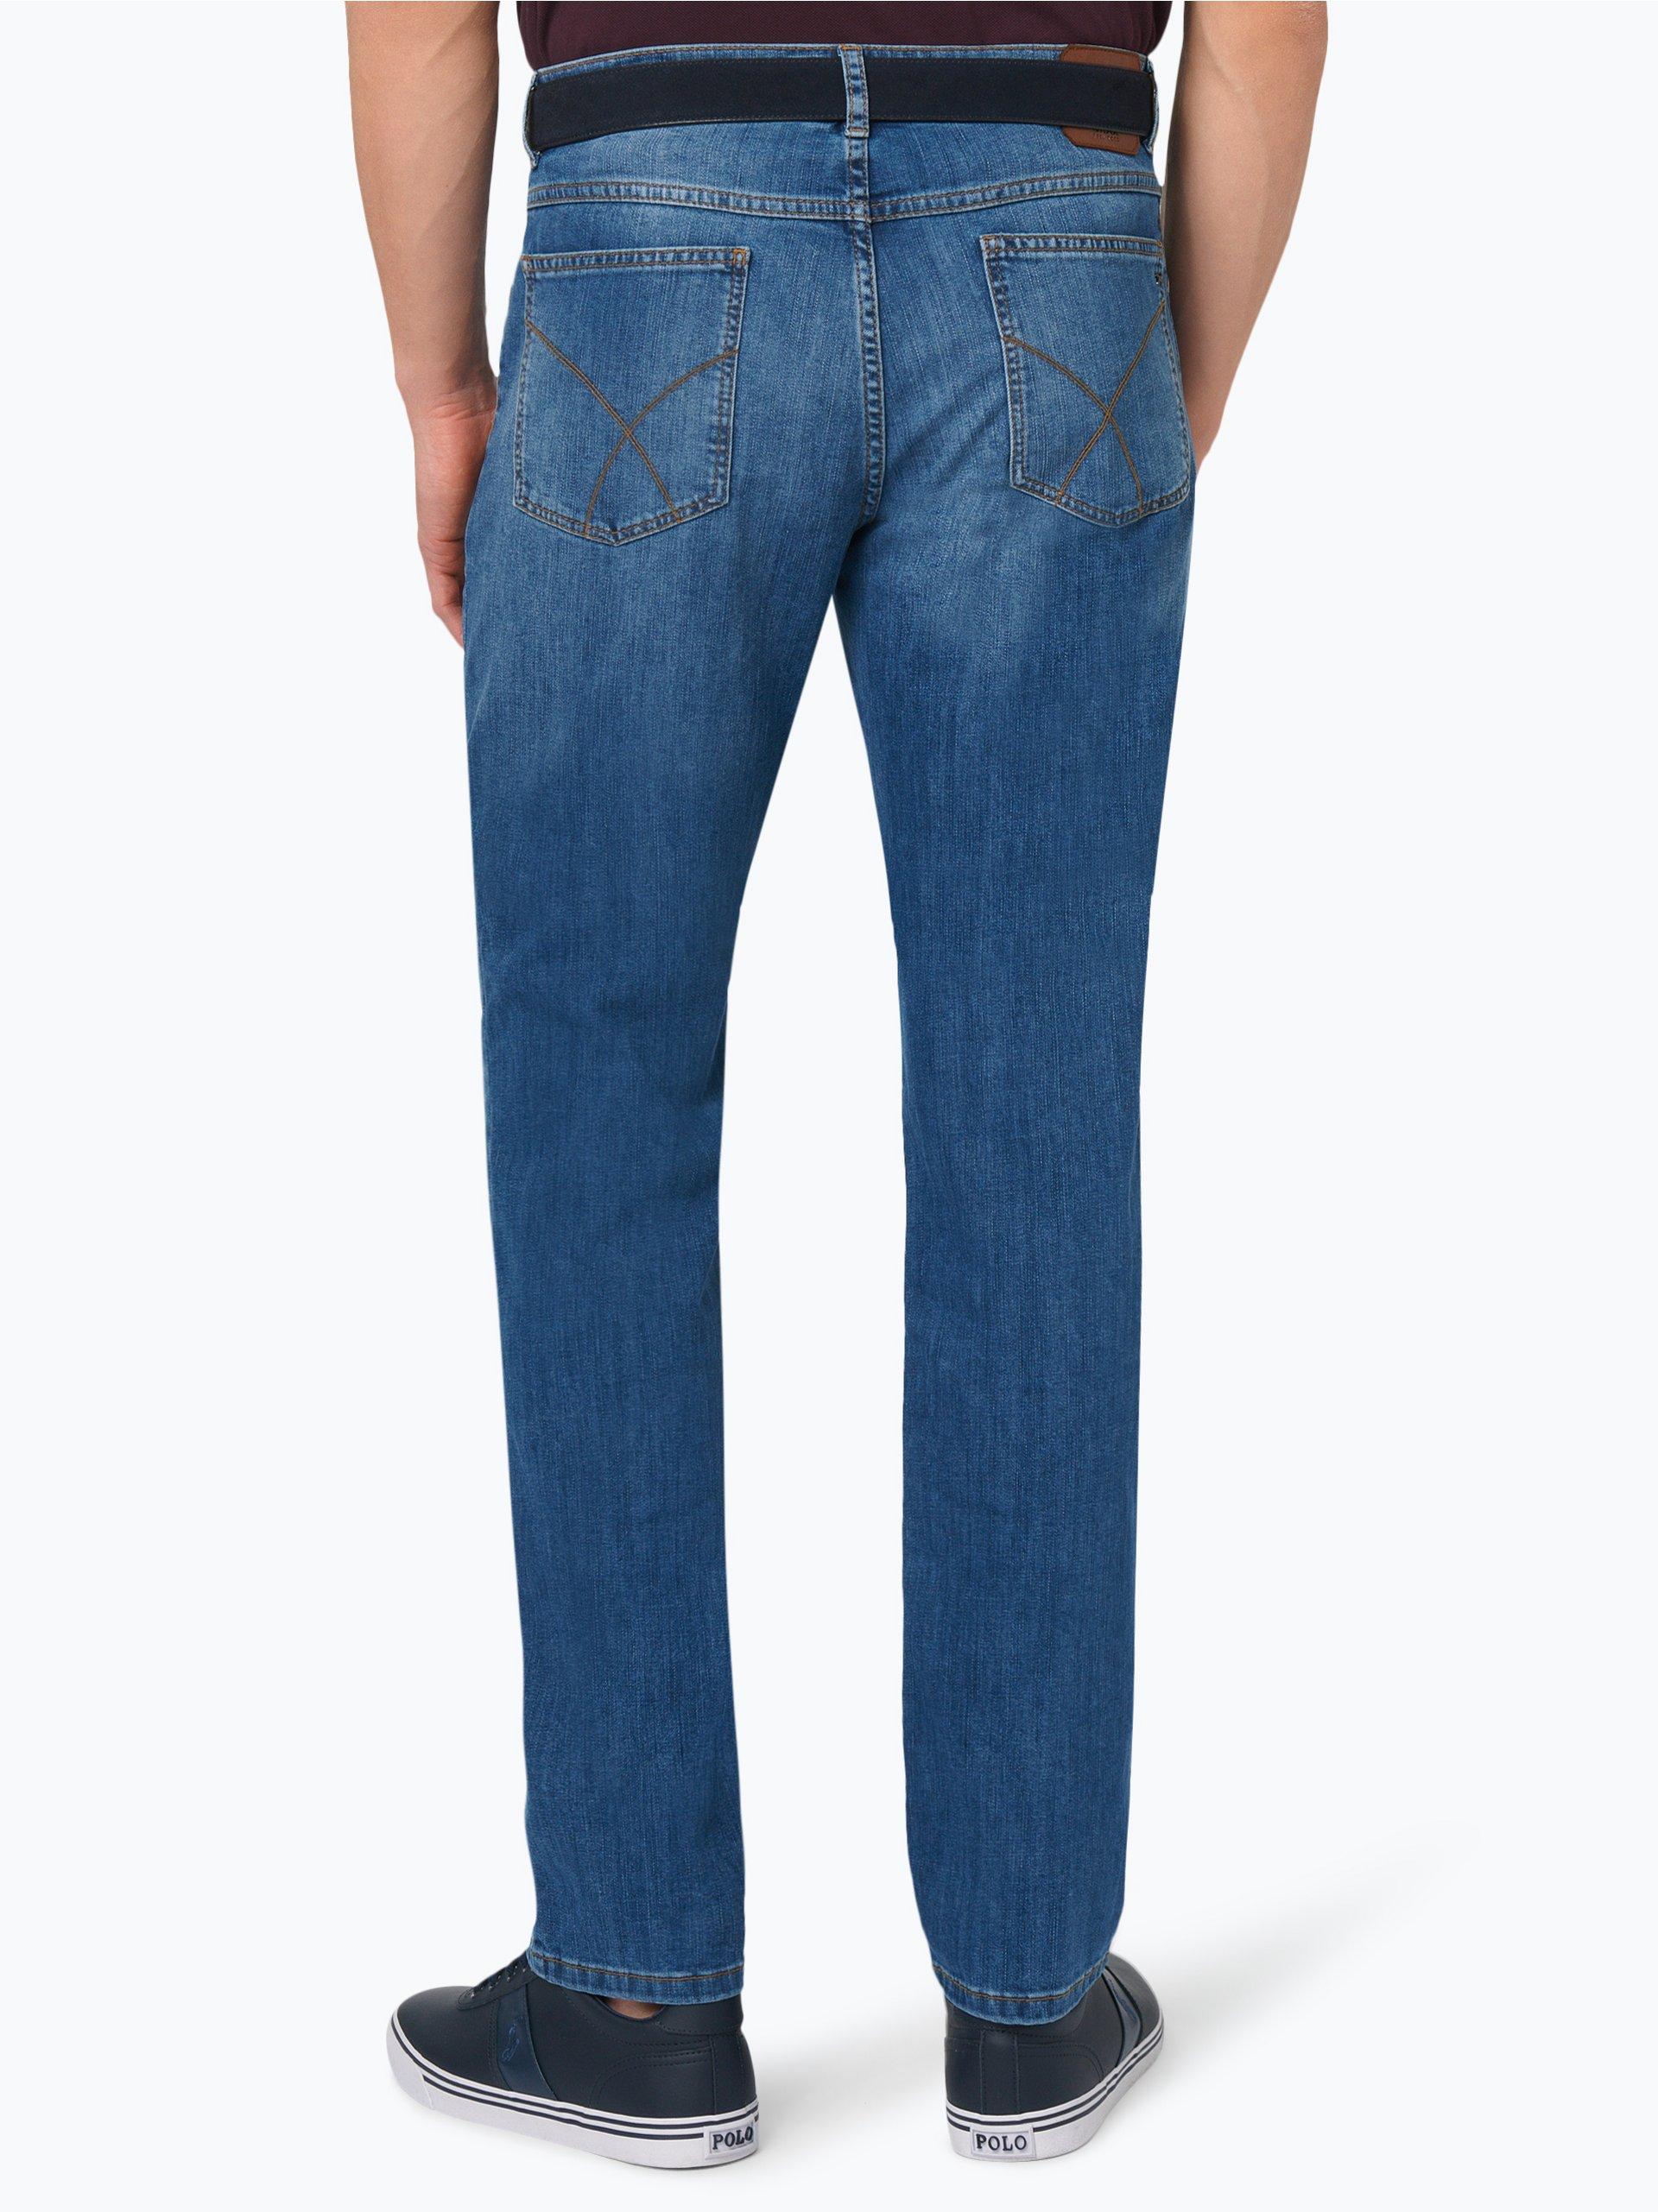 brax herren jeans cooper 2 online kaufen peek und cloppenburg de. Black Bedroom Furniture Sets. Home Design Ideas